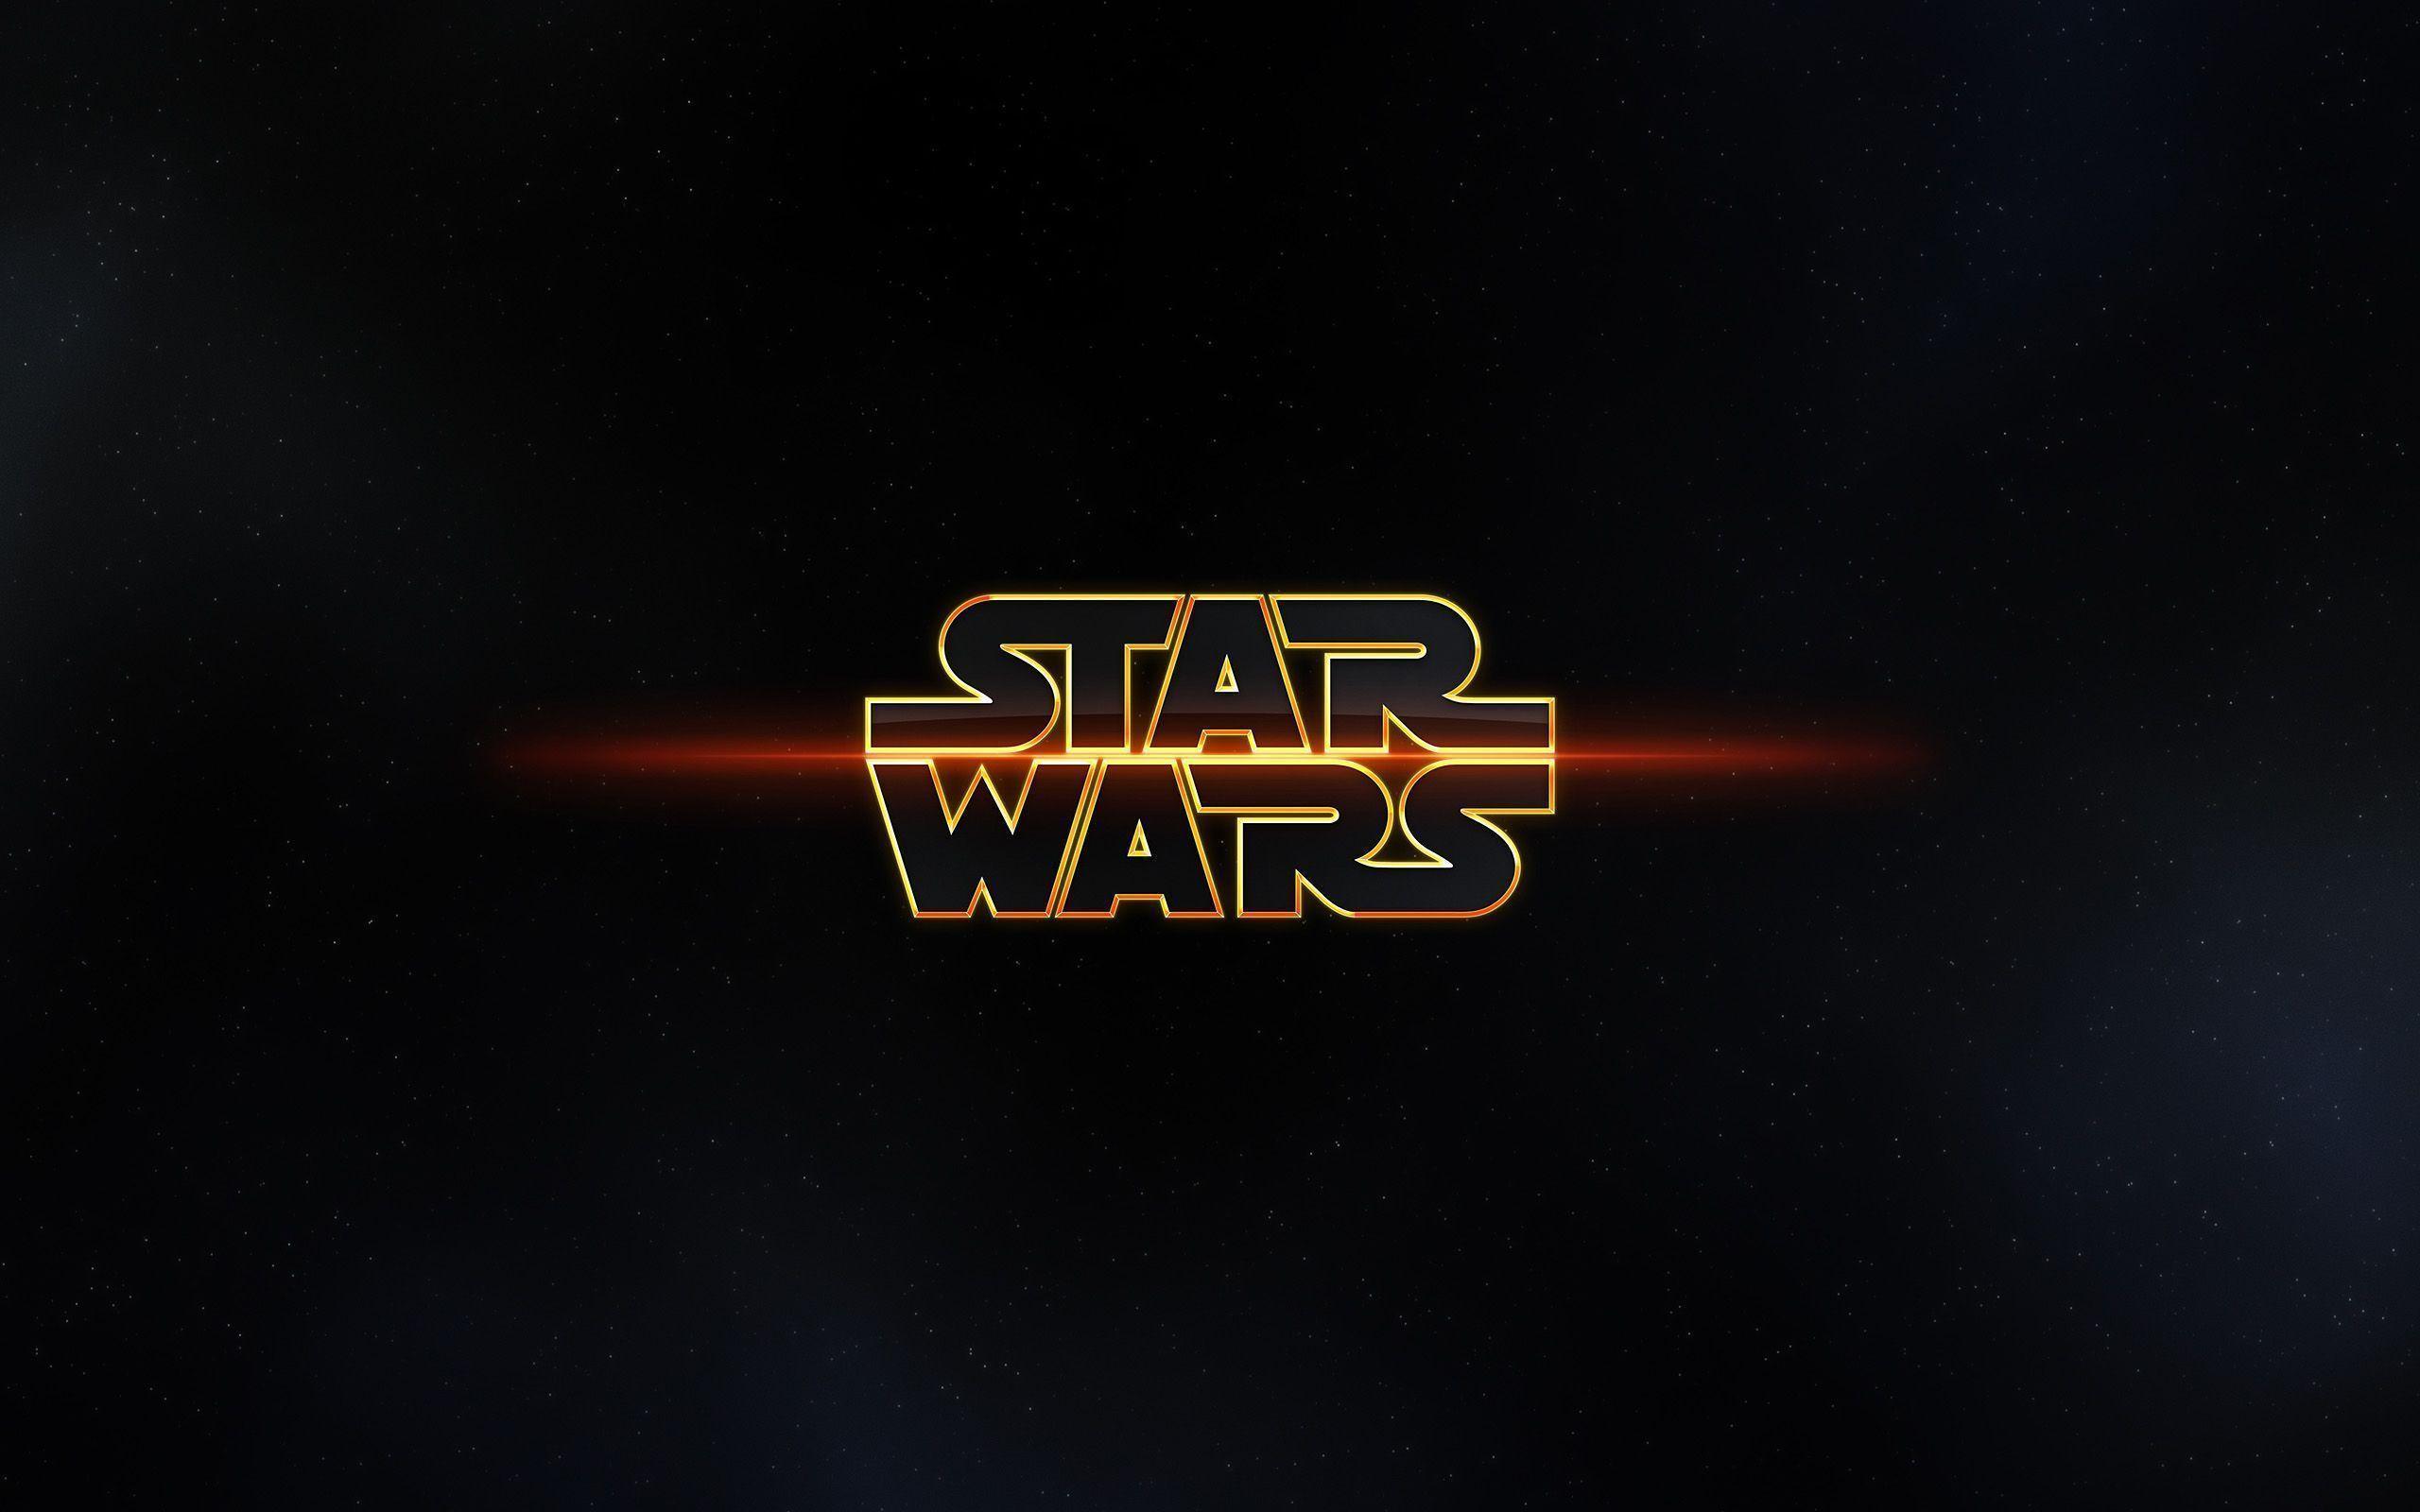 epic star wars trooper wallpaper - photo #32